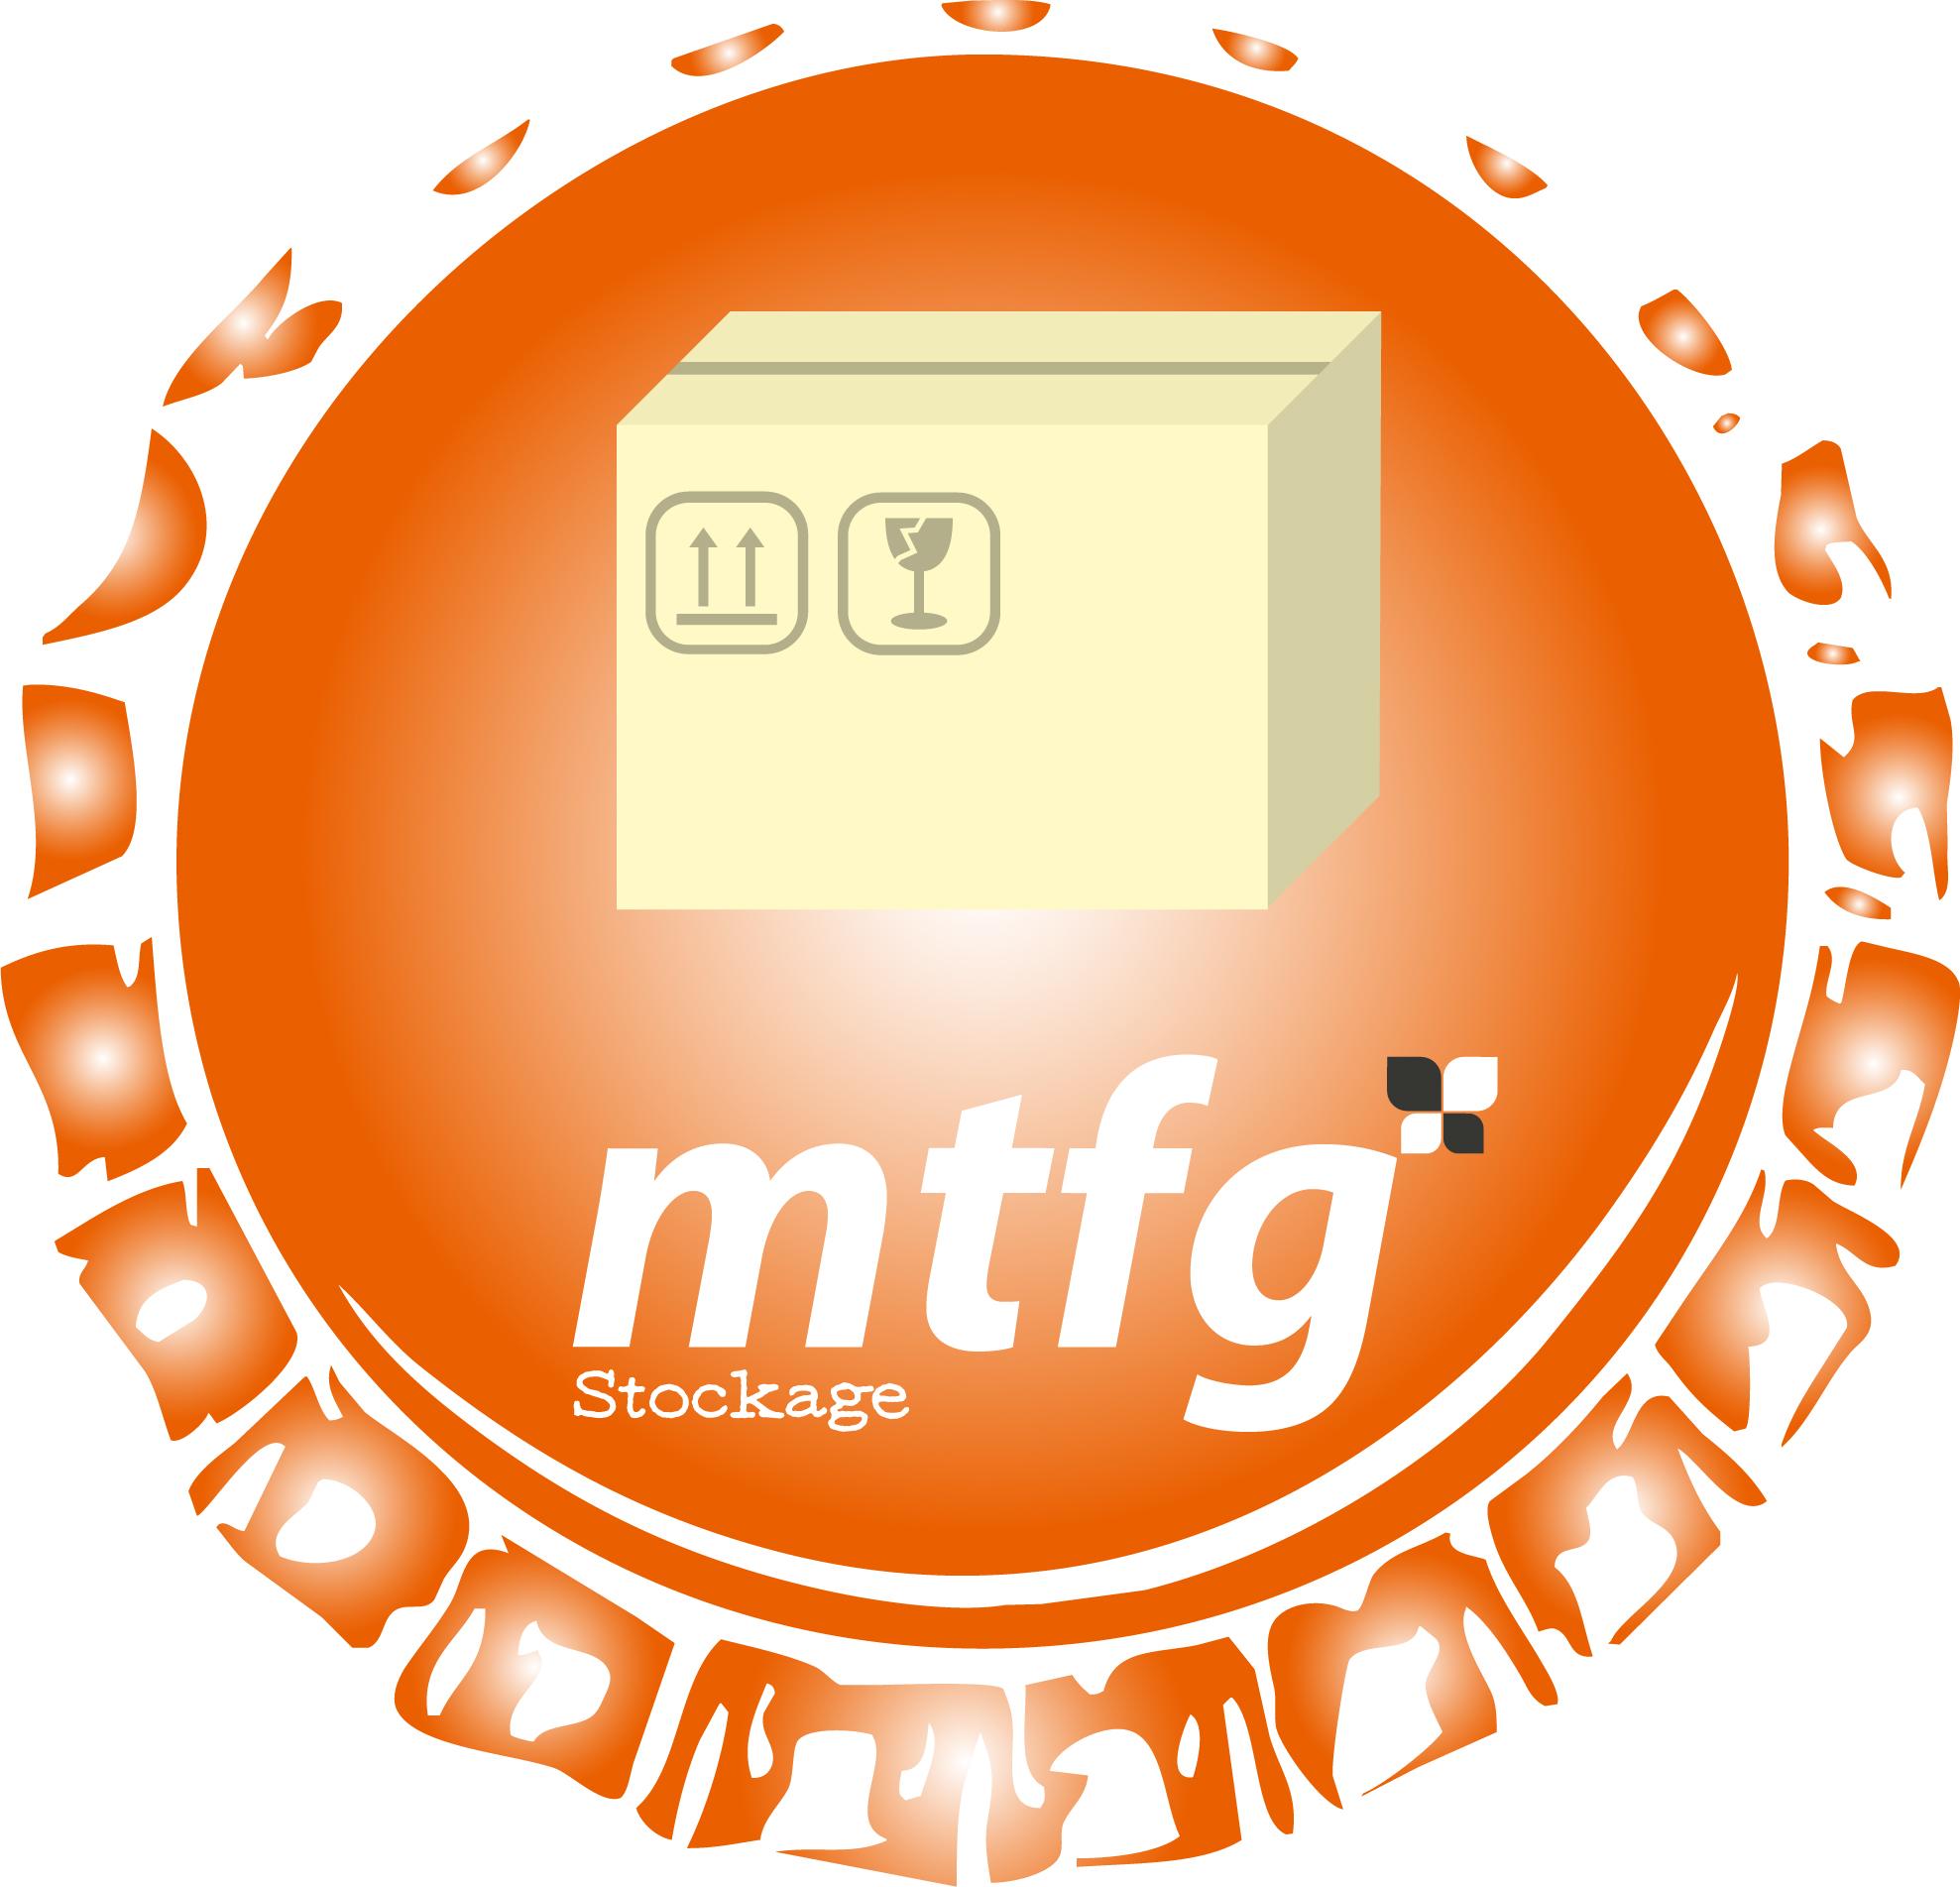 MTFG Stockage